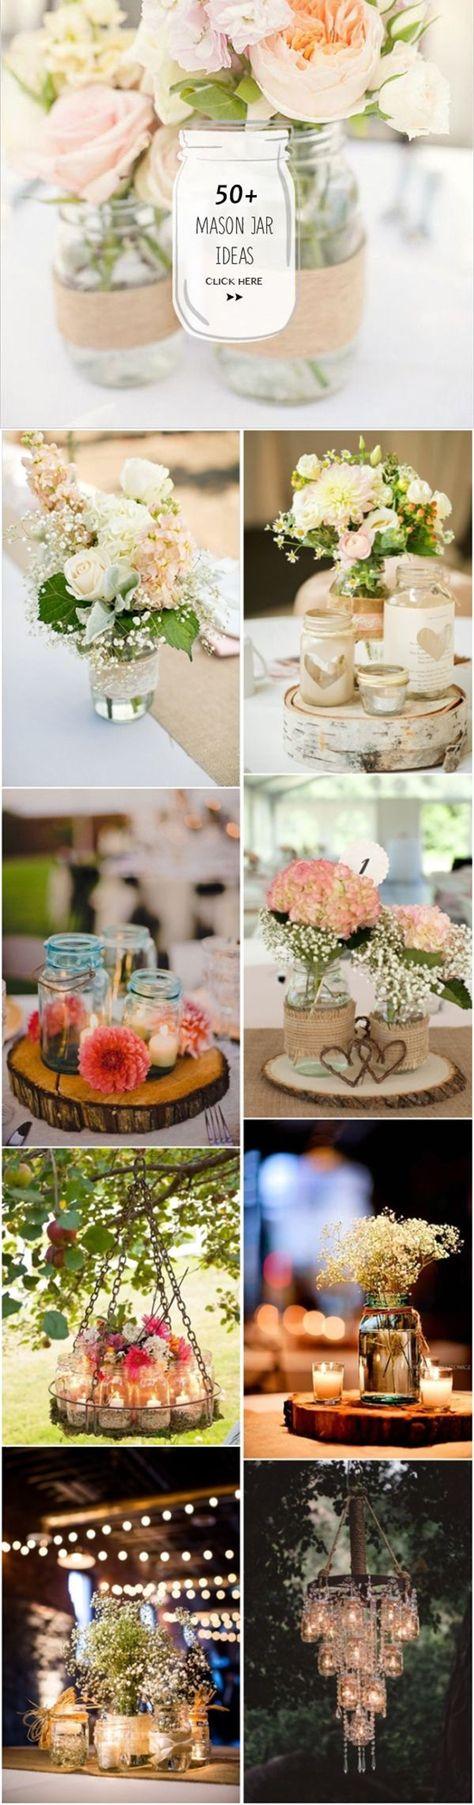 mason jar rustic wedding decor ideas - http://www.deerpearlflowers.com/50-ways-to-incorporate-mason-jars-into-your-wedding/